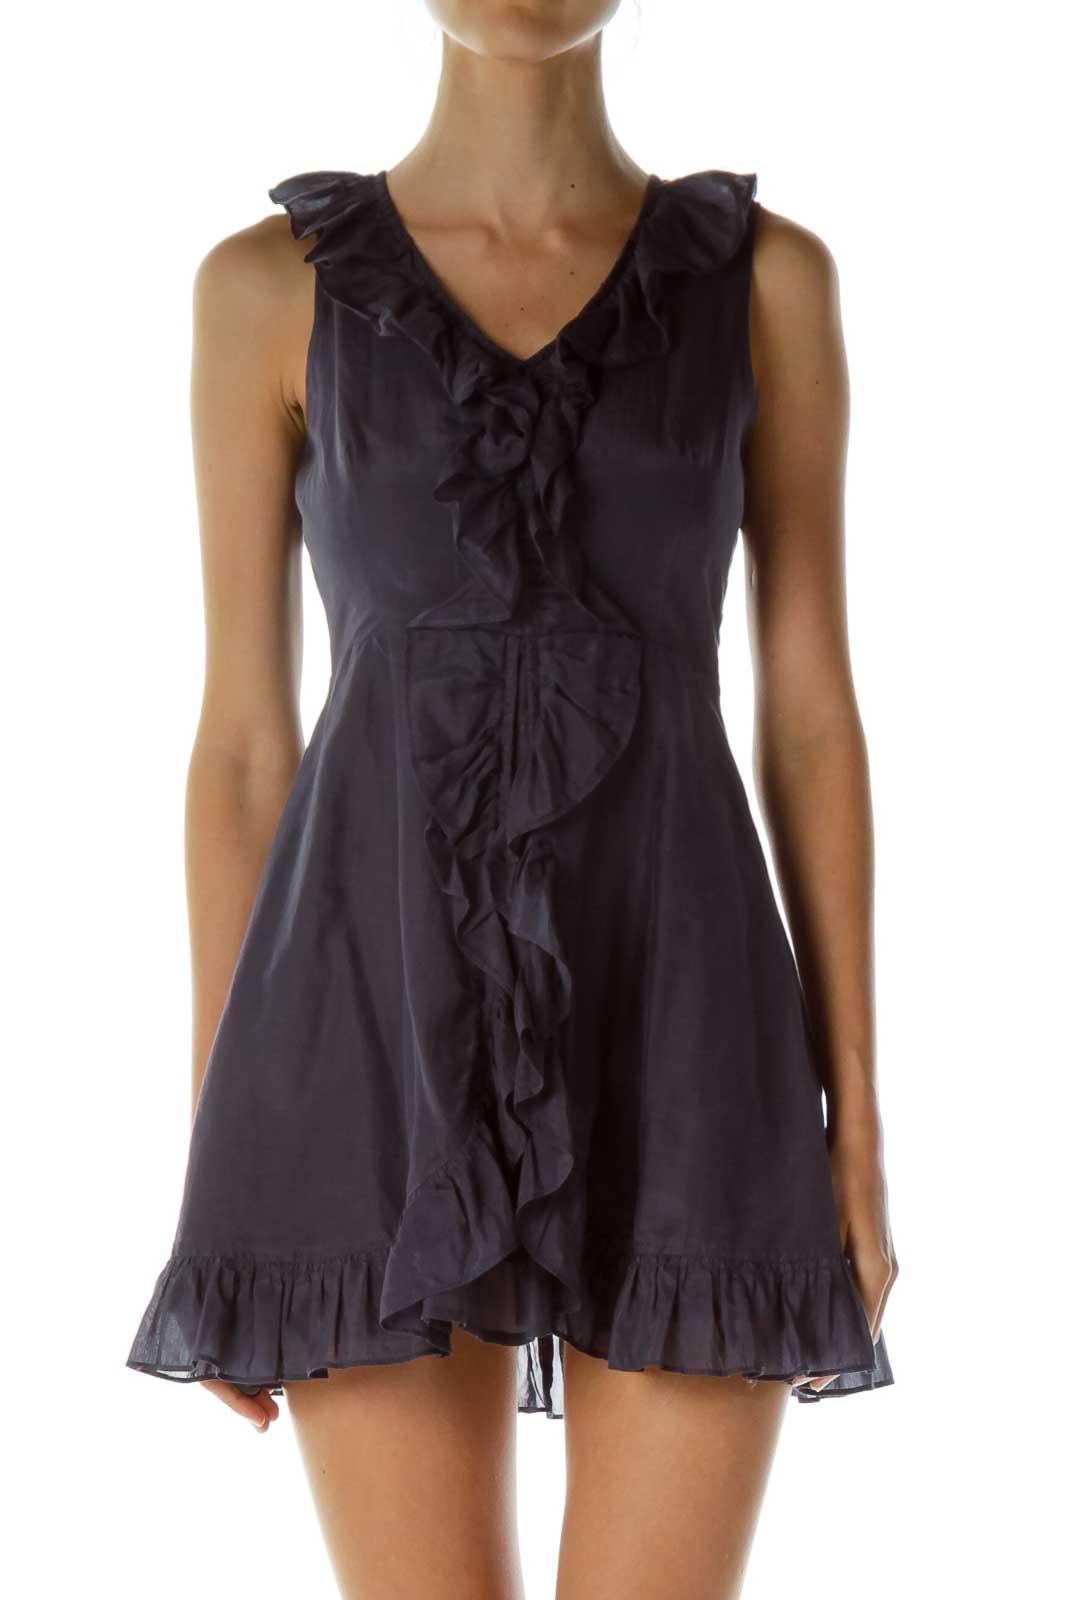 Purple Ruffled Sleeveless Cocktail Dress Front